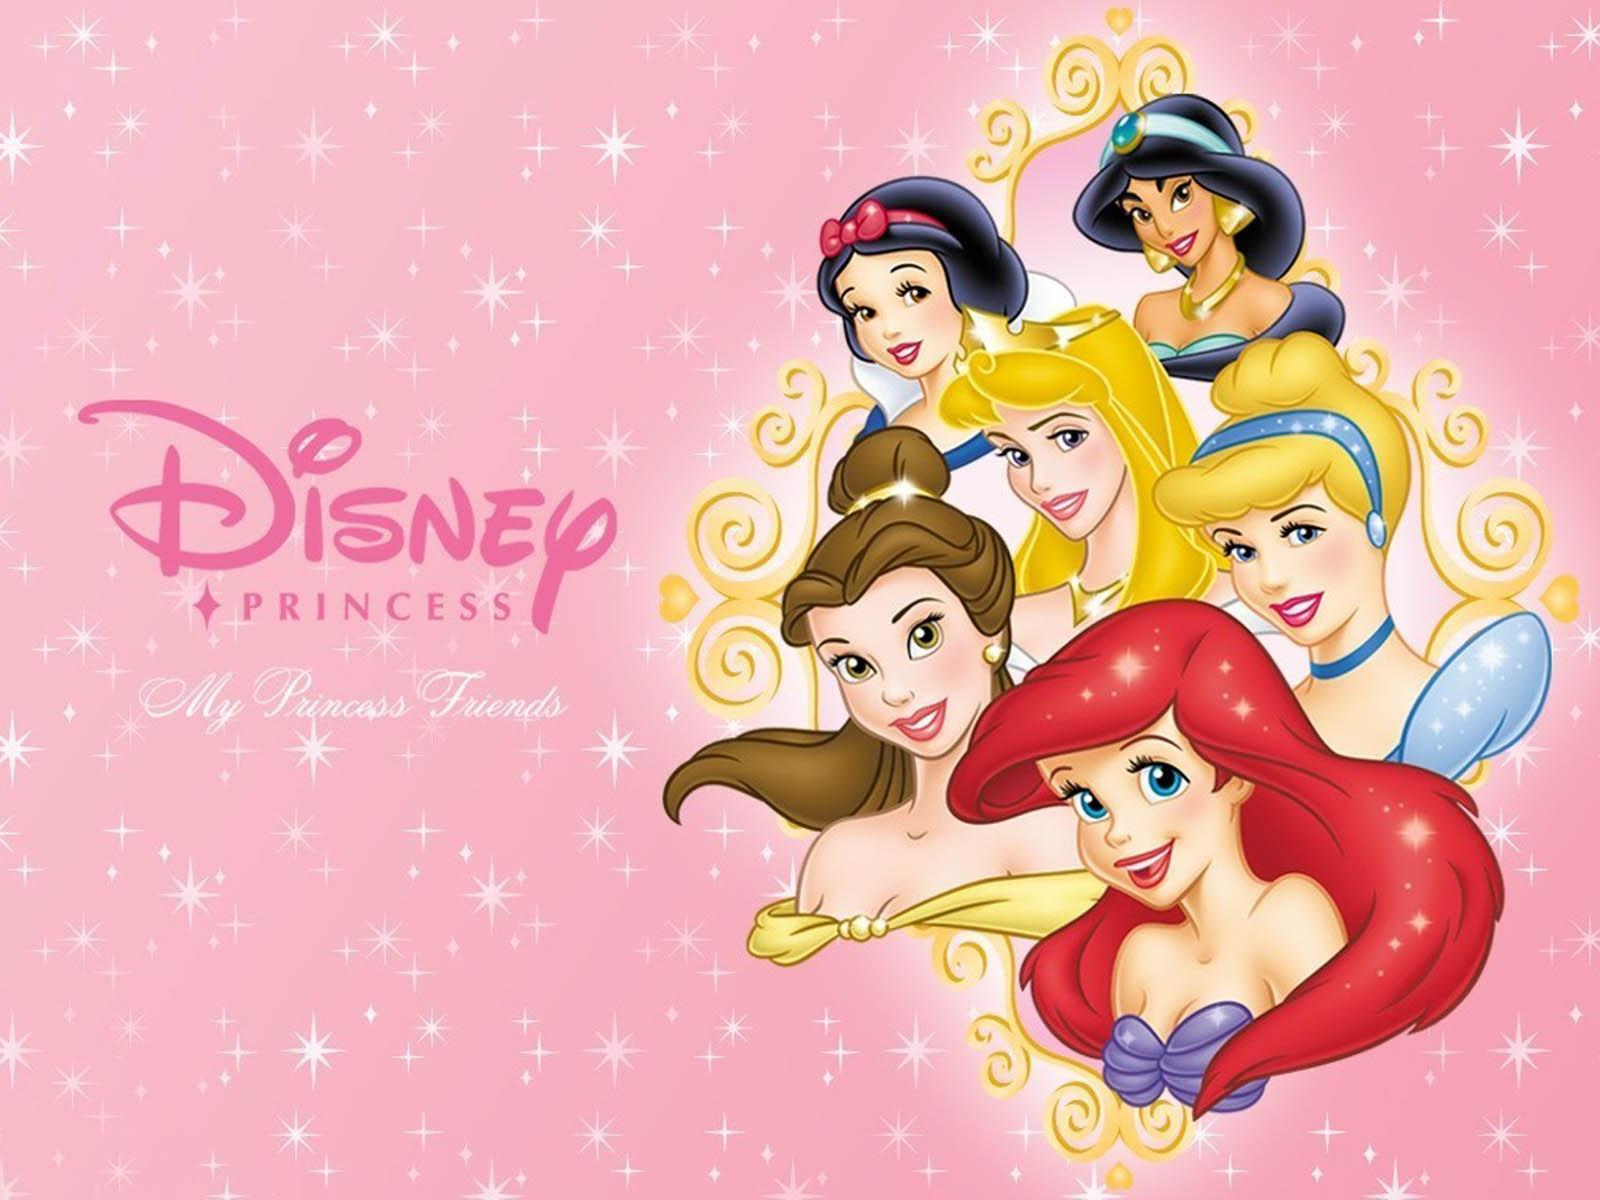 wallpapers Disney Princess Wallpapers 1600x1200